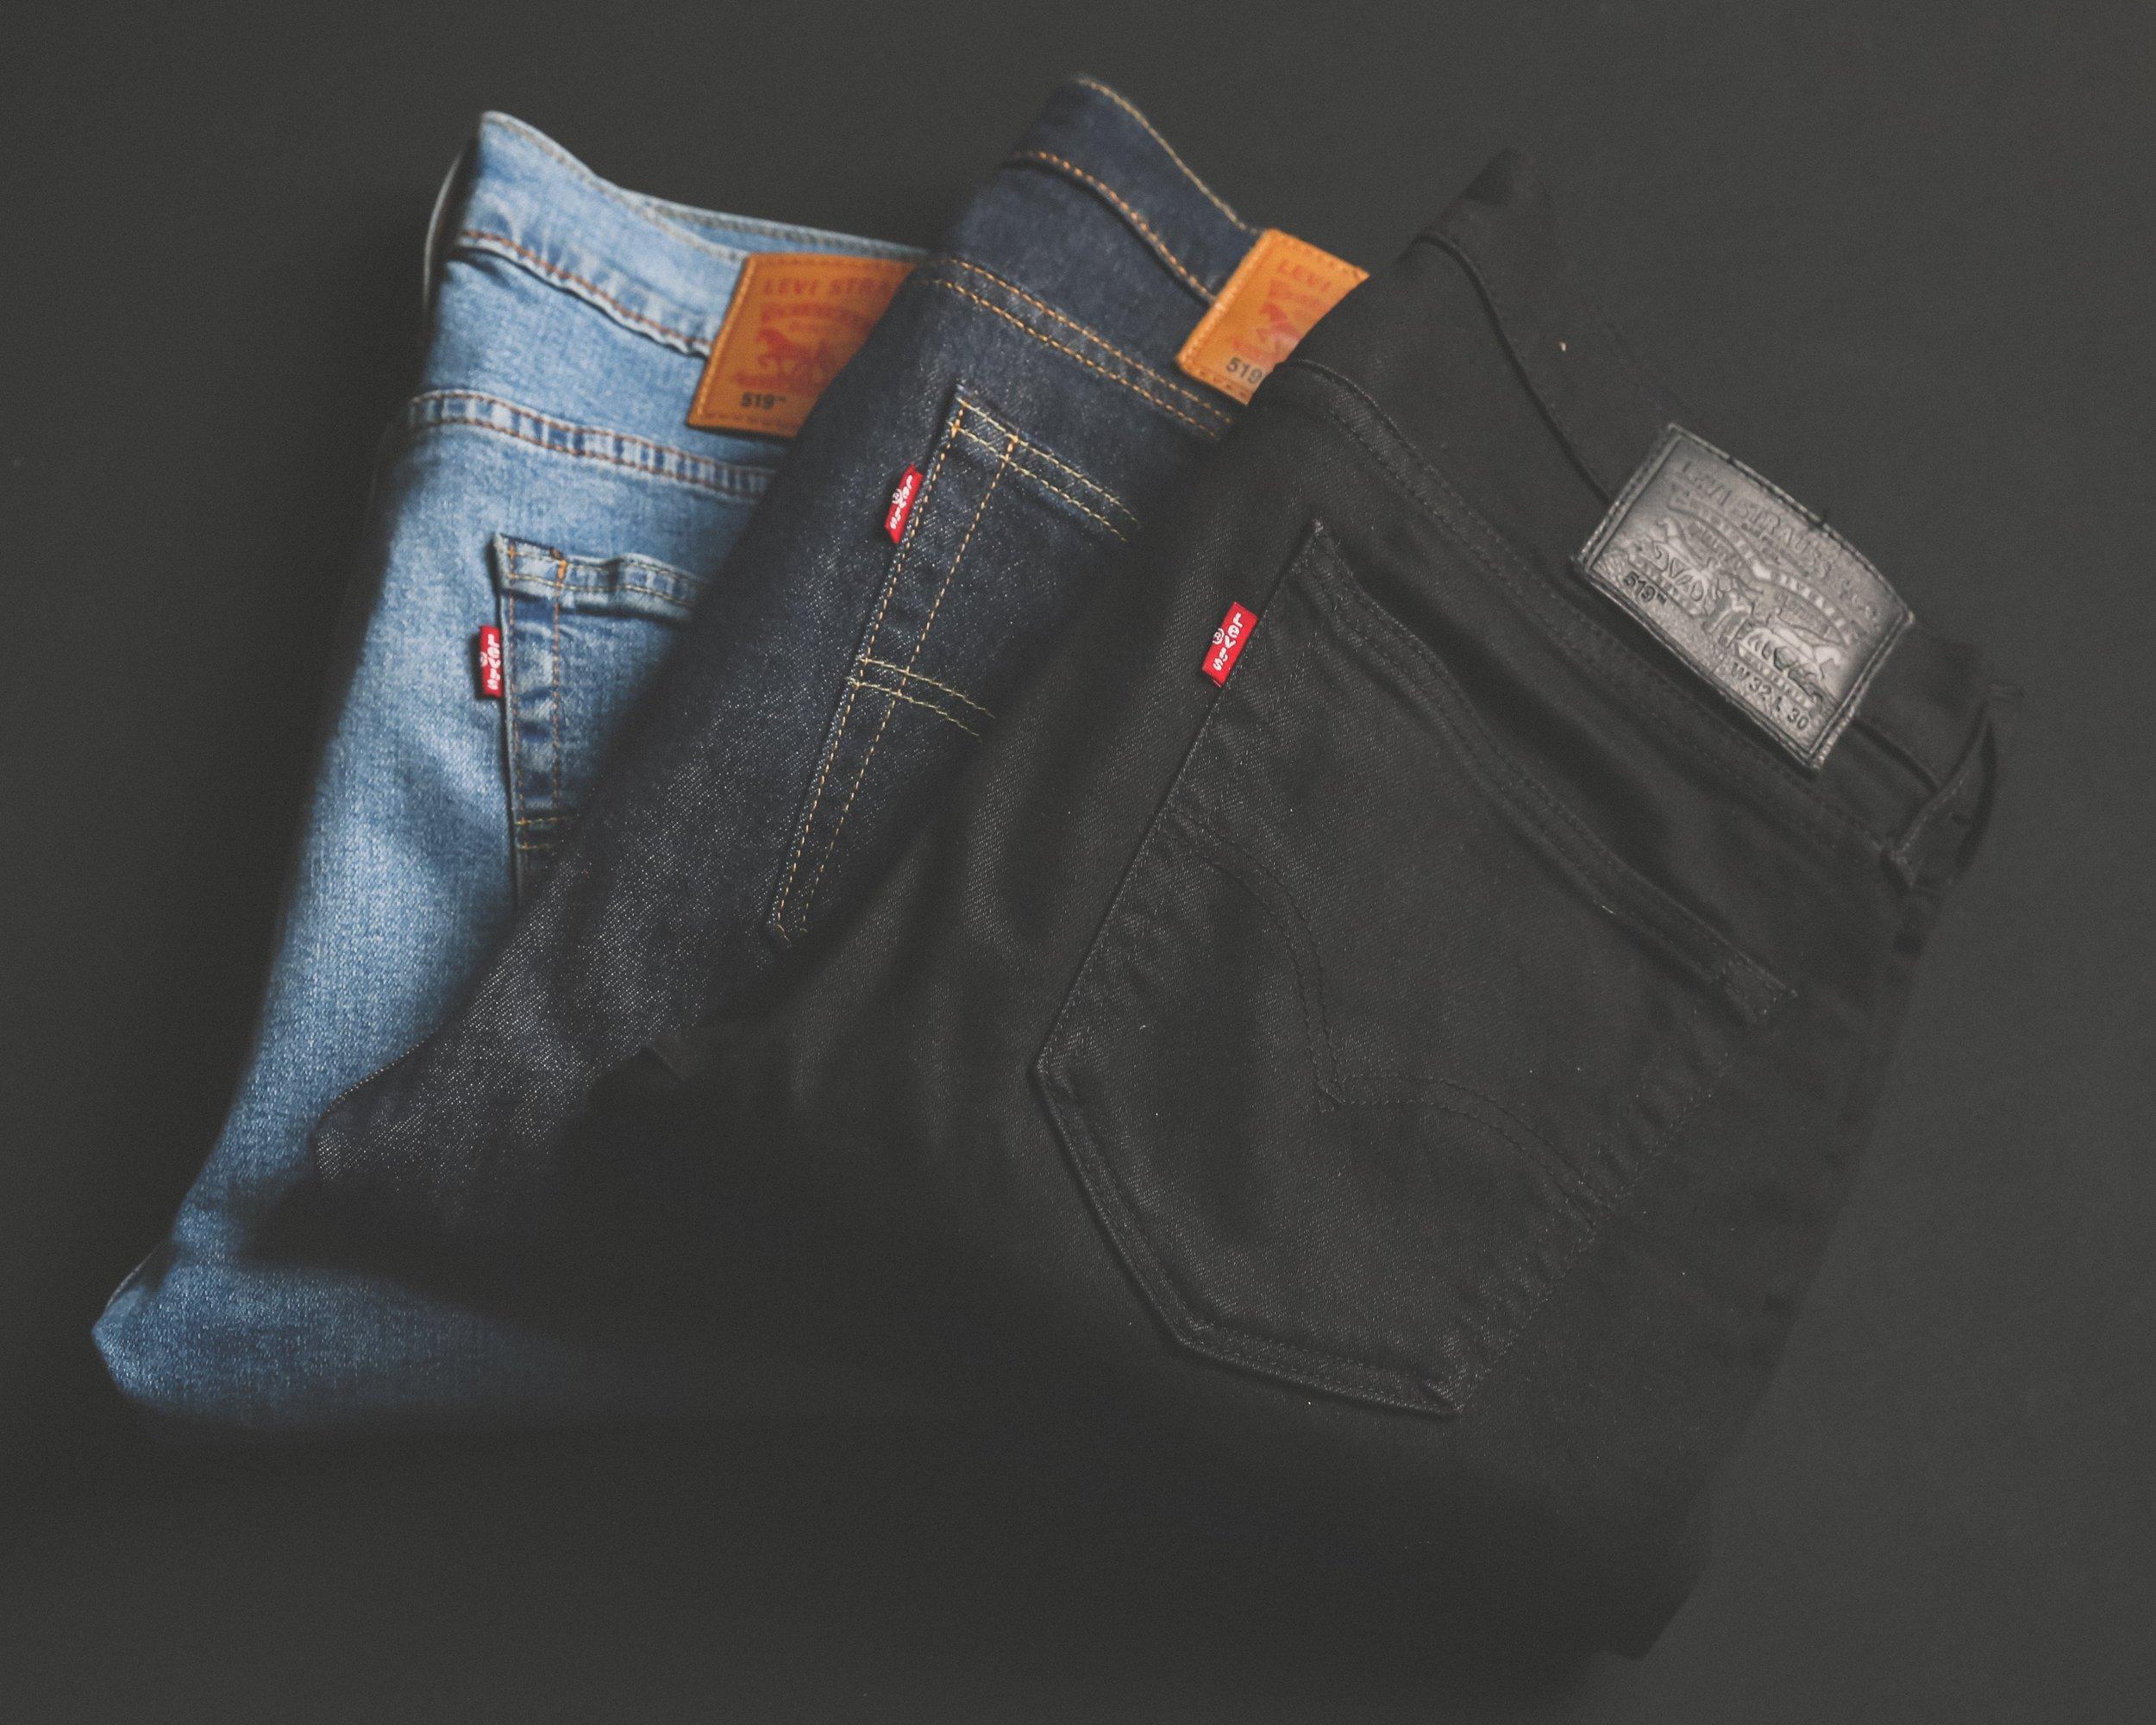 blue-jeans-denim-denim-jeans-1598507.jpg